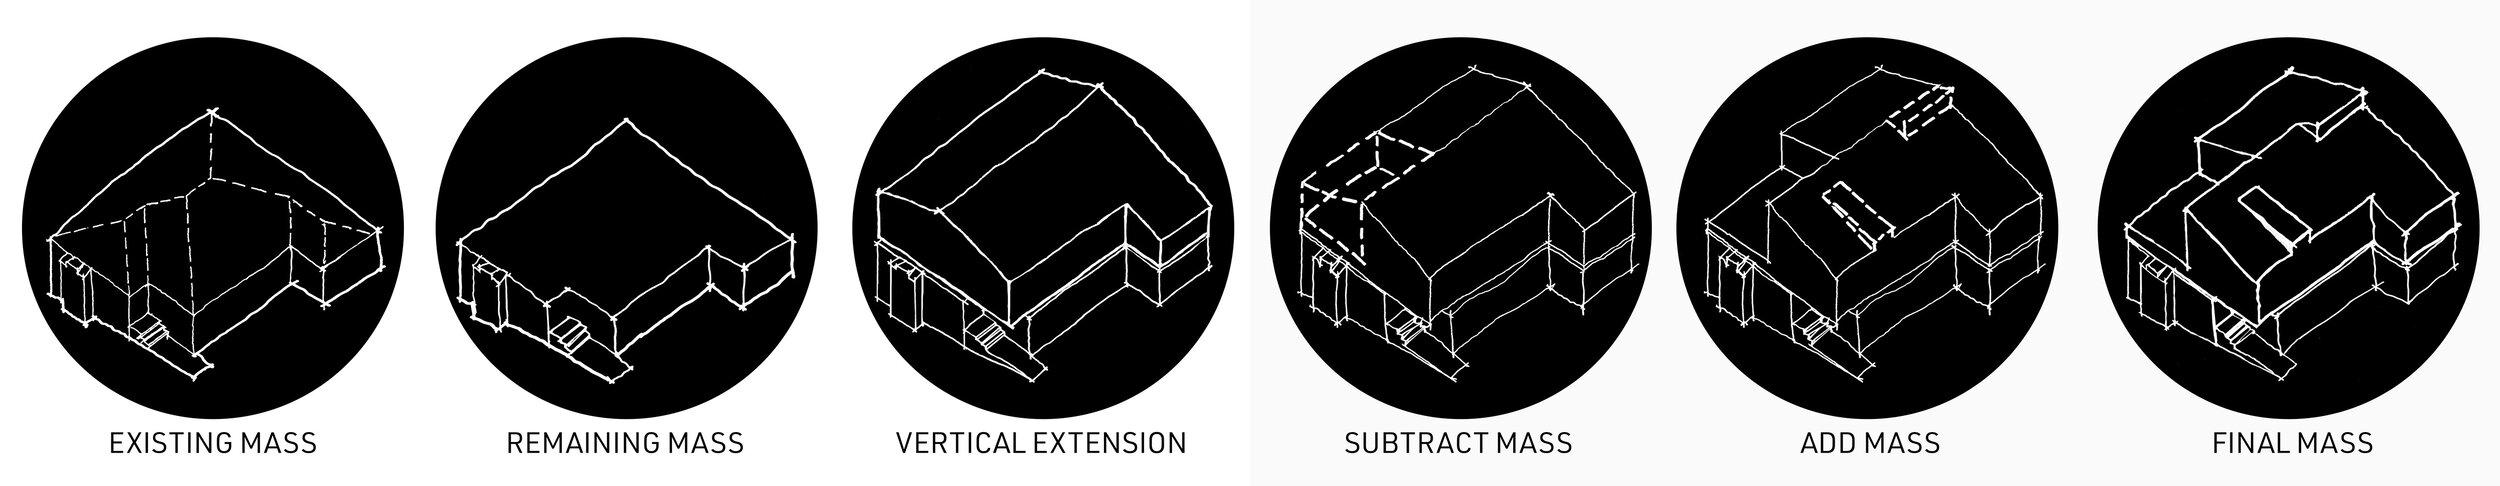 Form Diagram.jpg